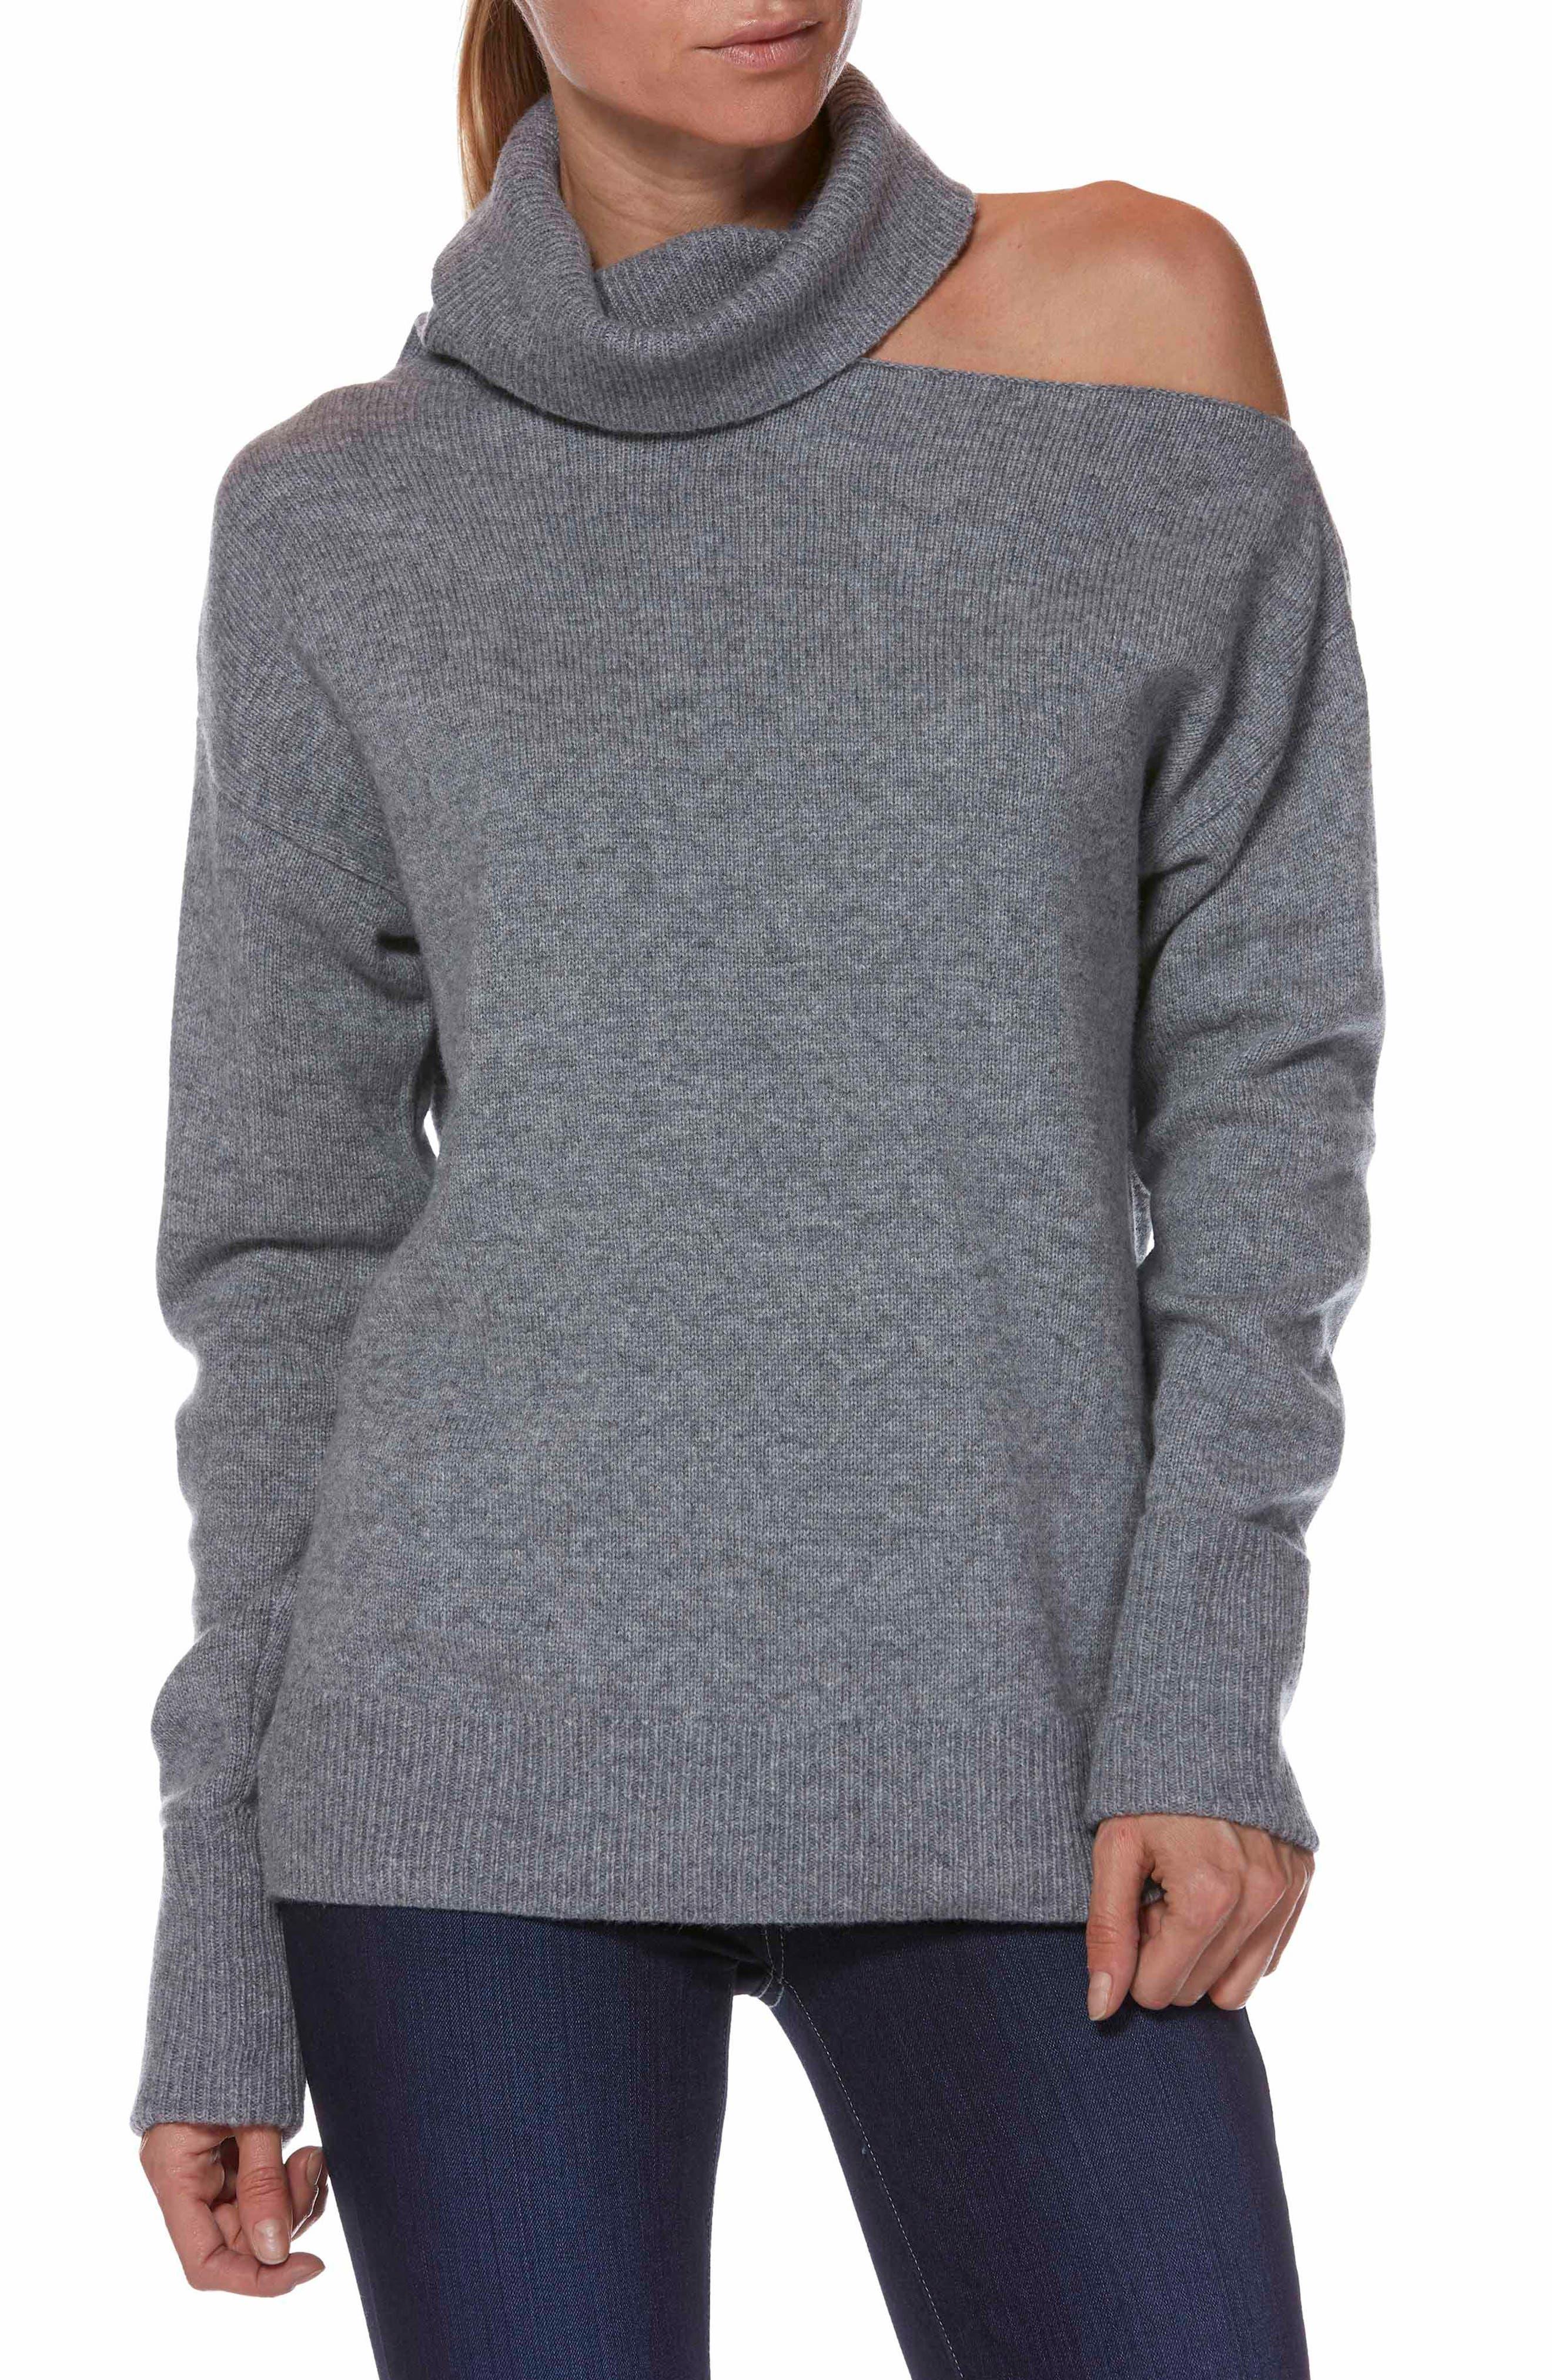 Raundi Cutout Shoulder Sweater,                             Main thumbnail 1, color,                             HEATHER GREY